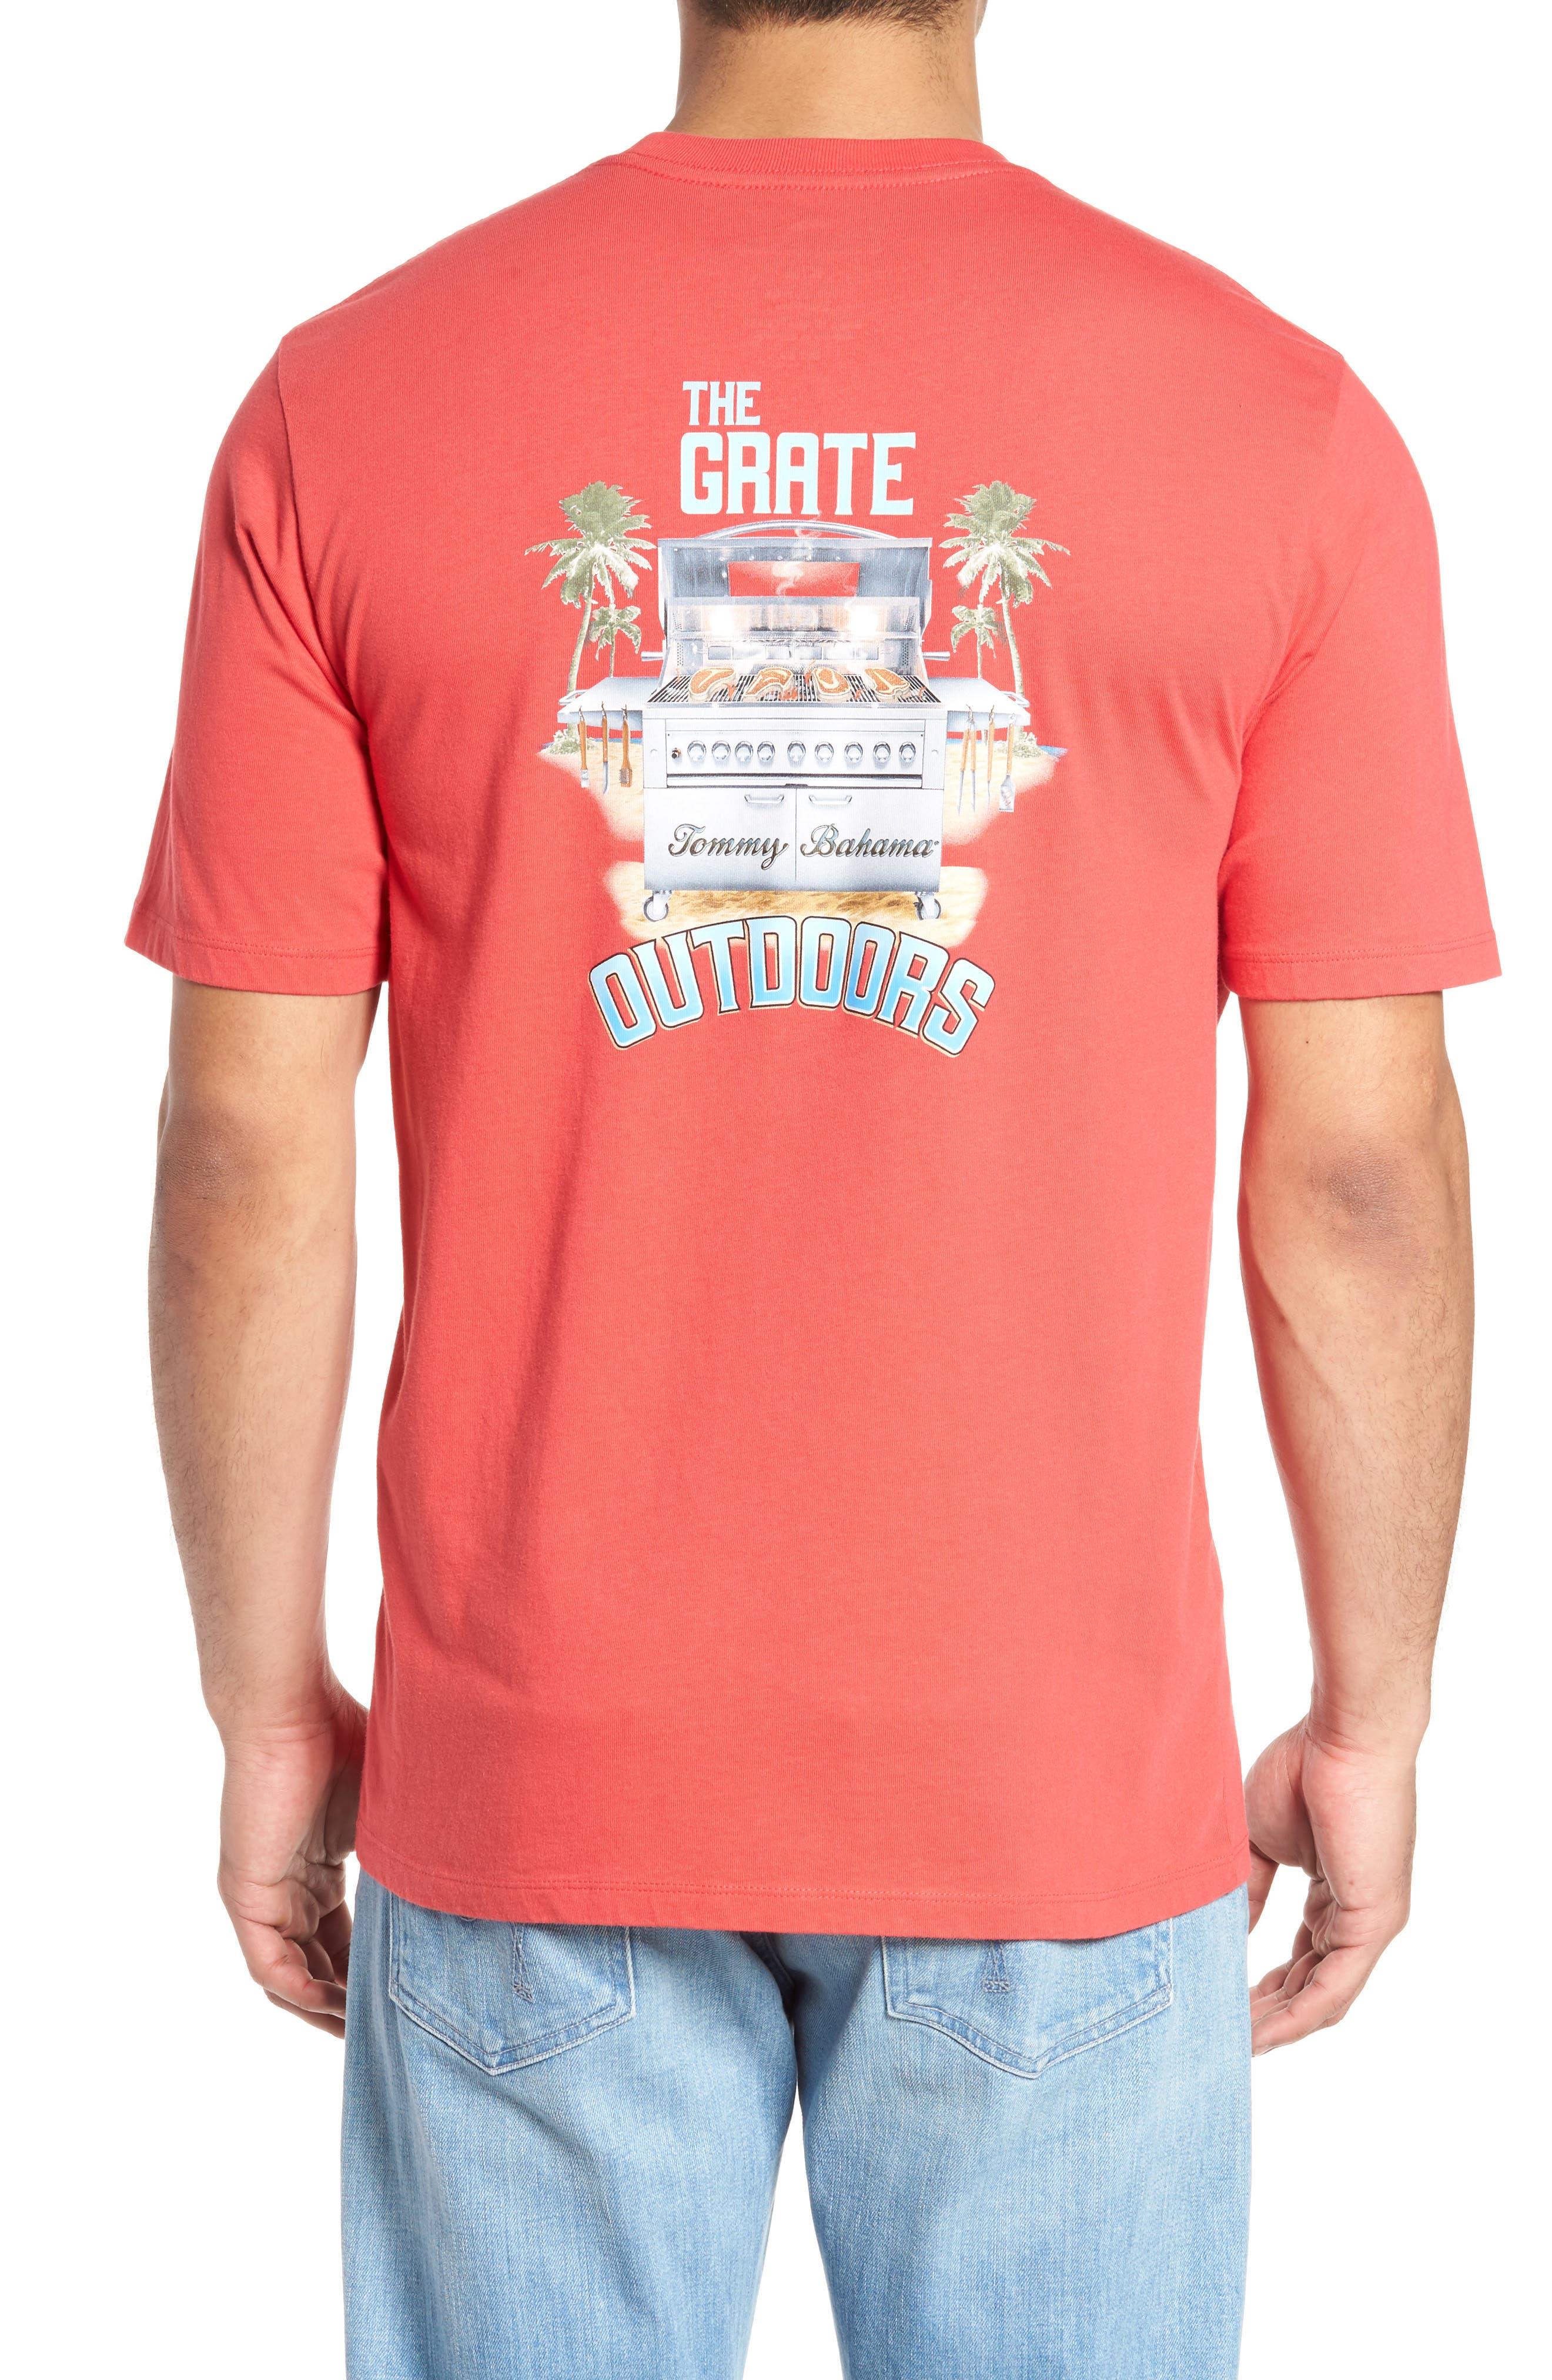 Grate Outdoors T-Shirt,                             Alternate thumbnail 2, color,                             600